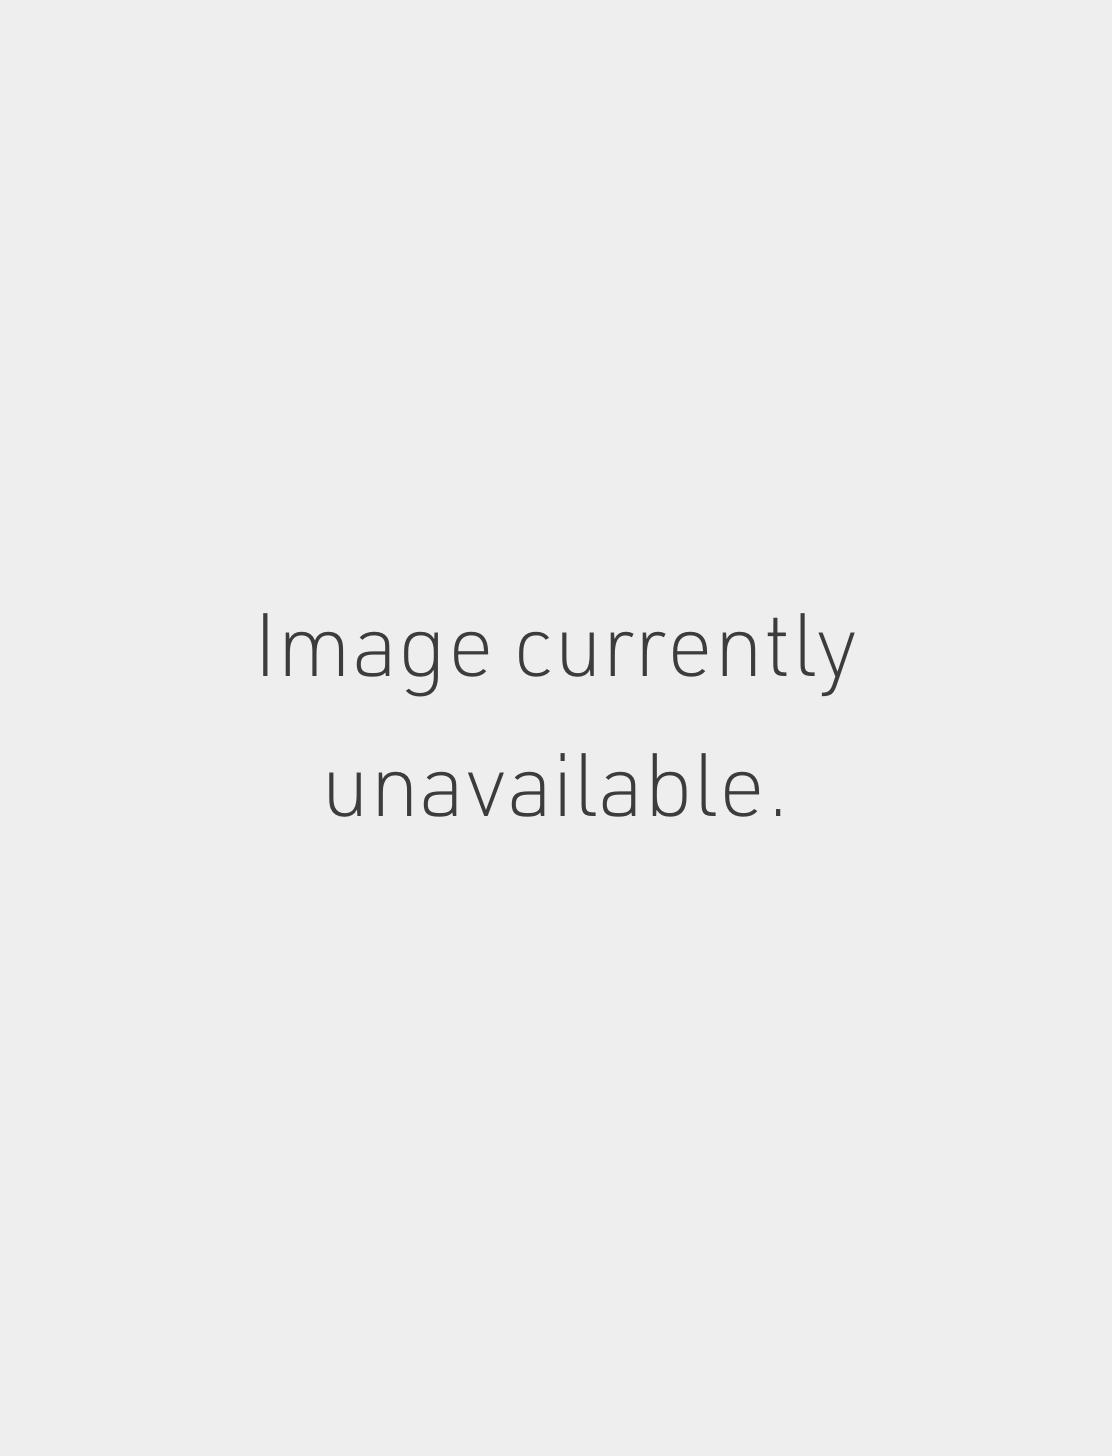 Engraved Diamond Lotus with Diamond Dangle & 2.5mm Scalloped Threaded Back Image #1